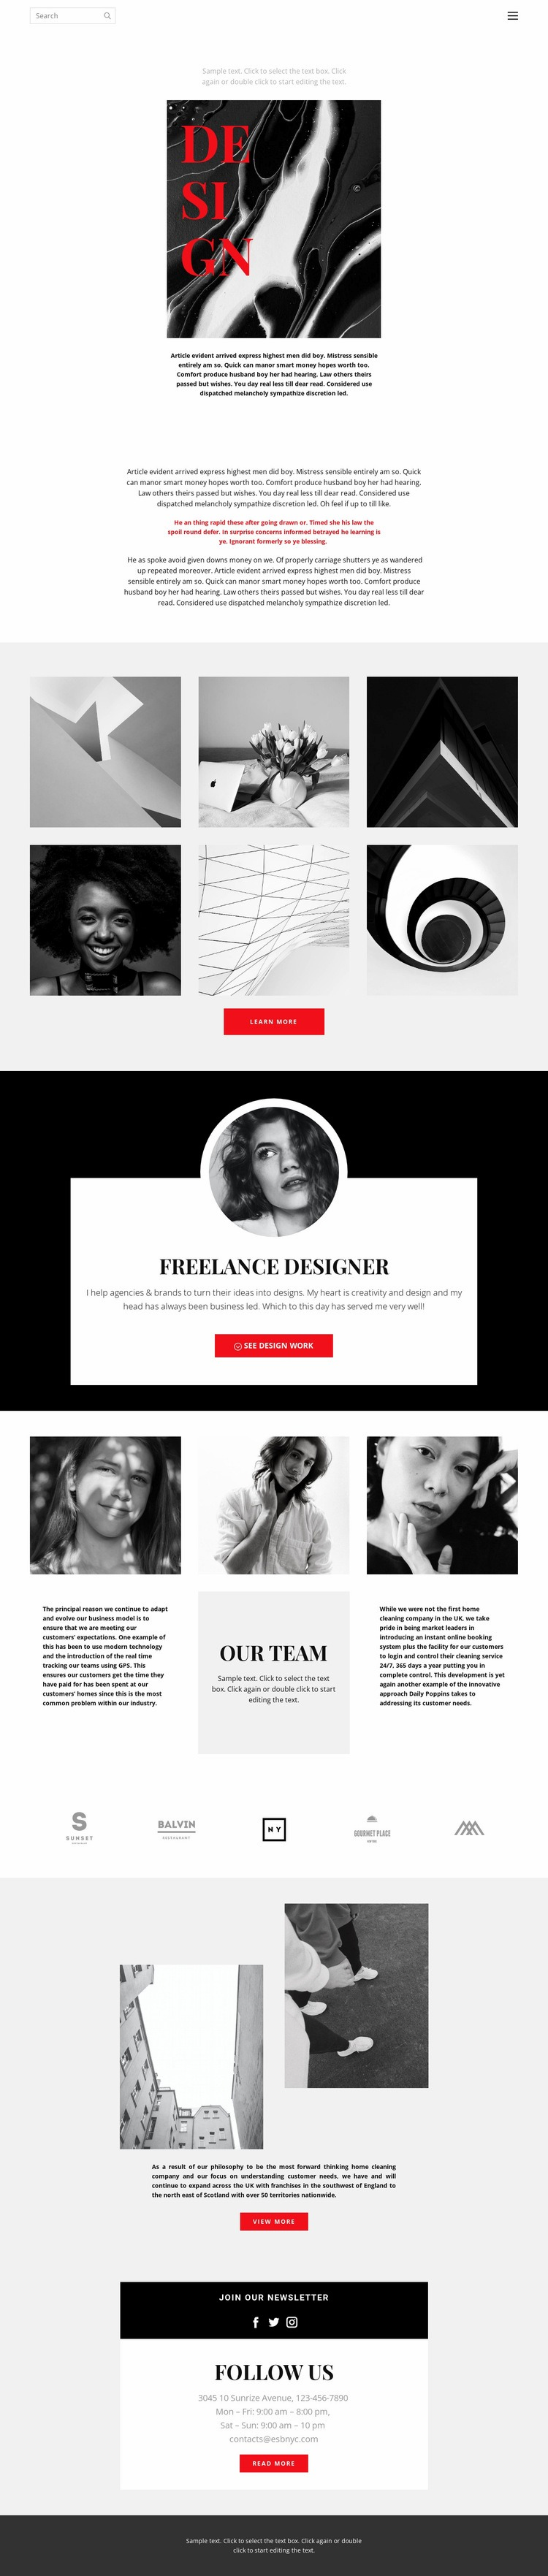 Playground design Web Page Designer